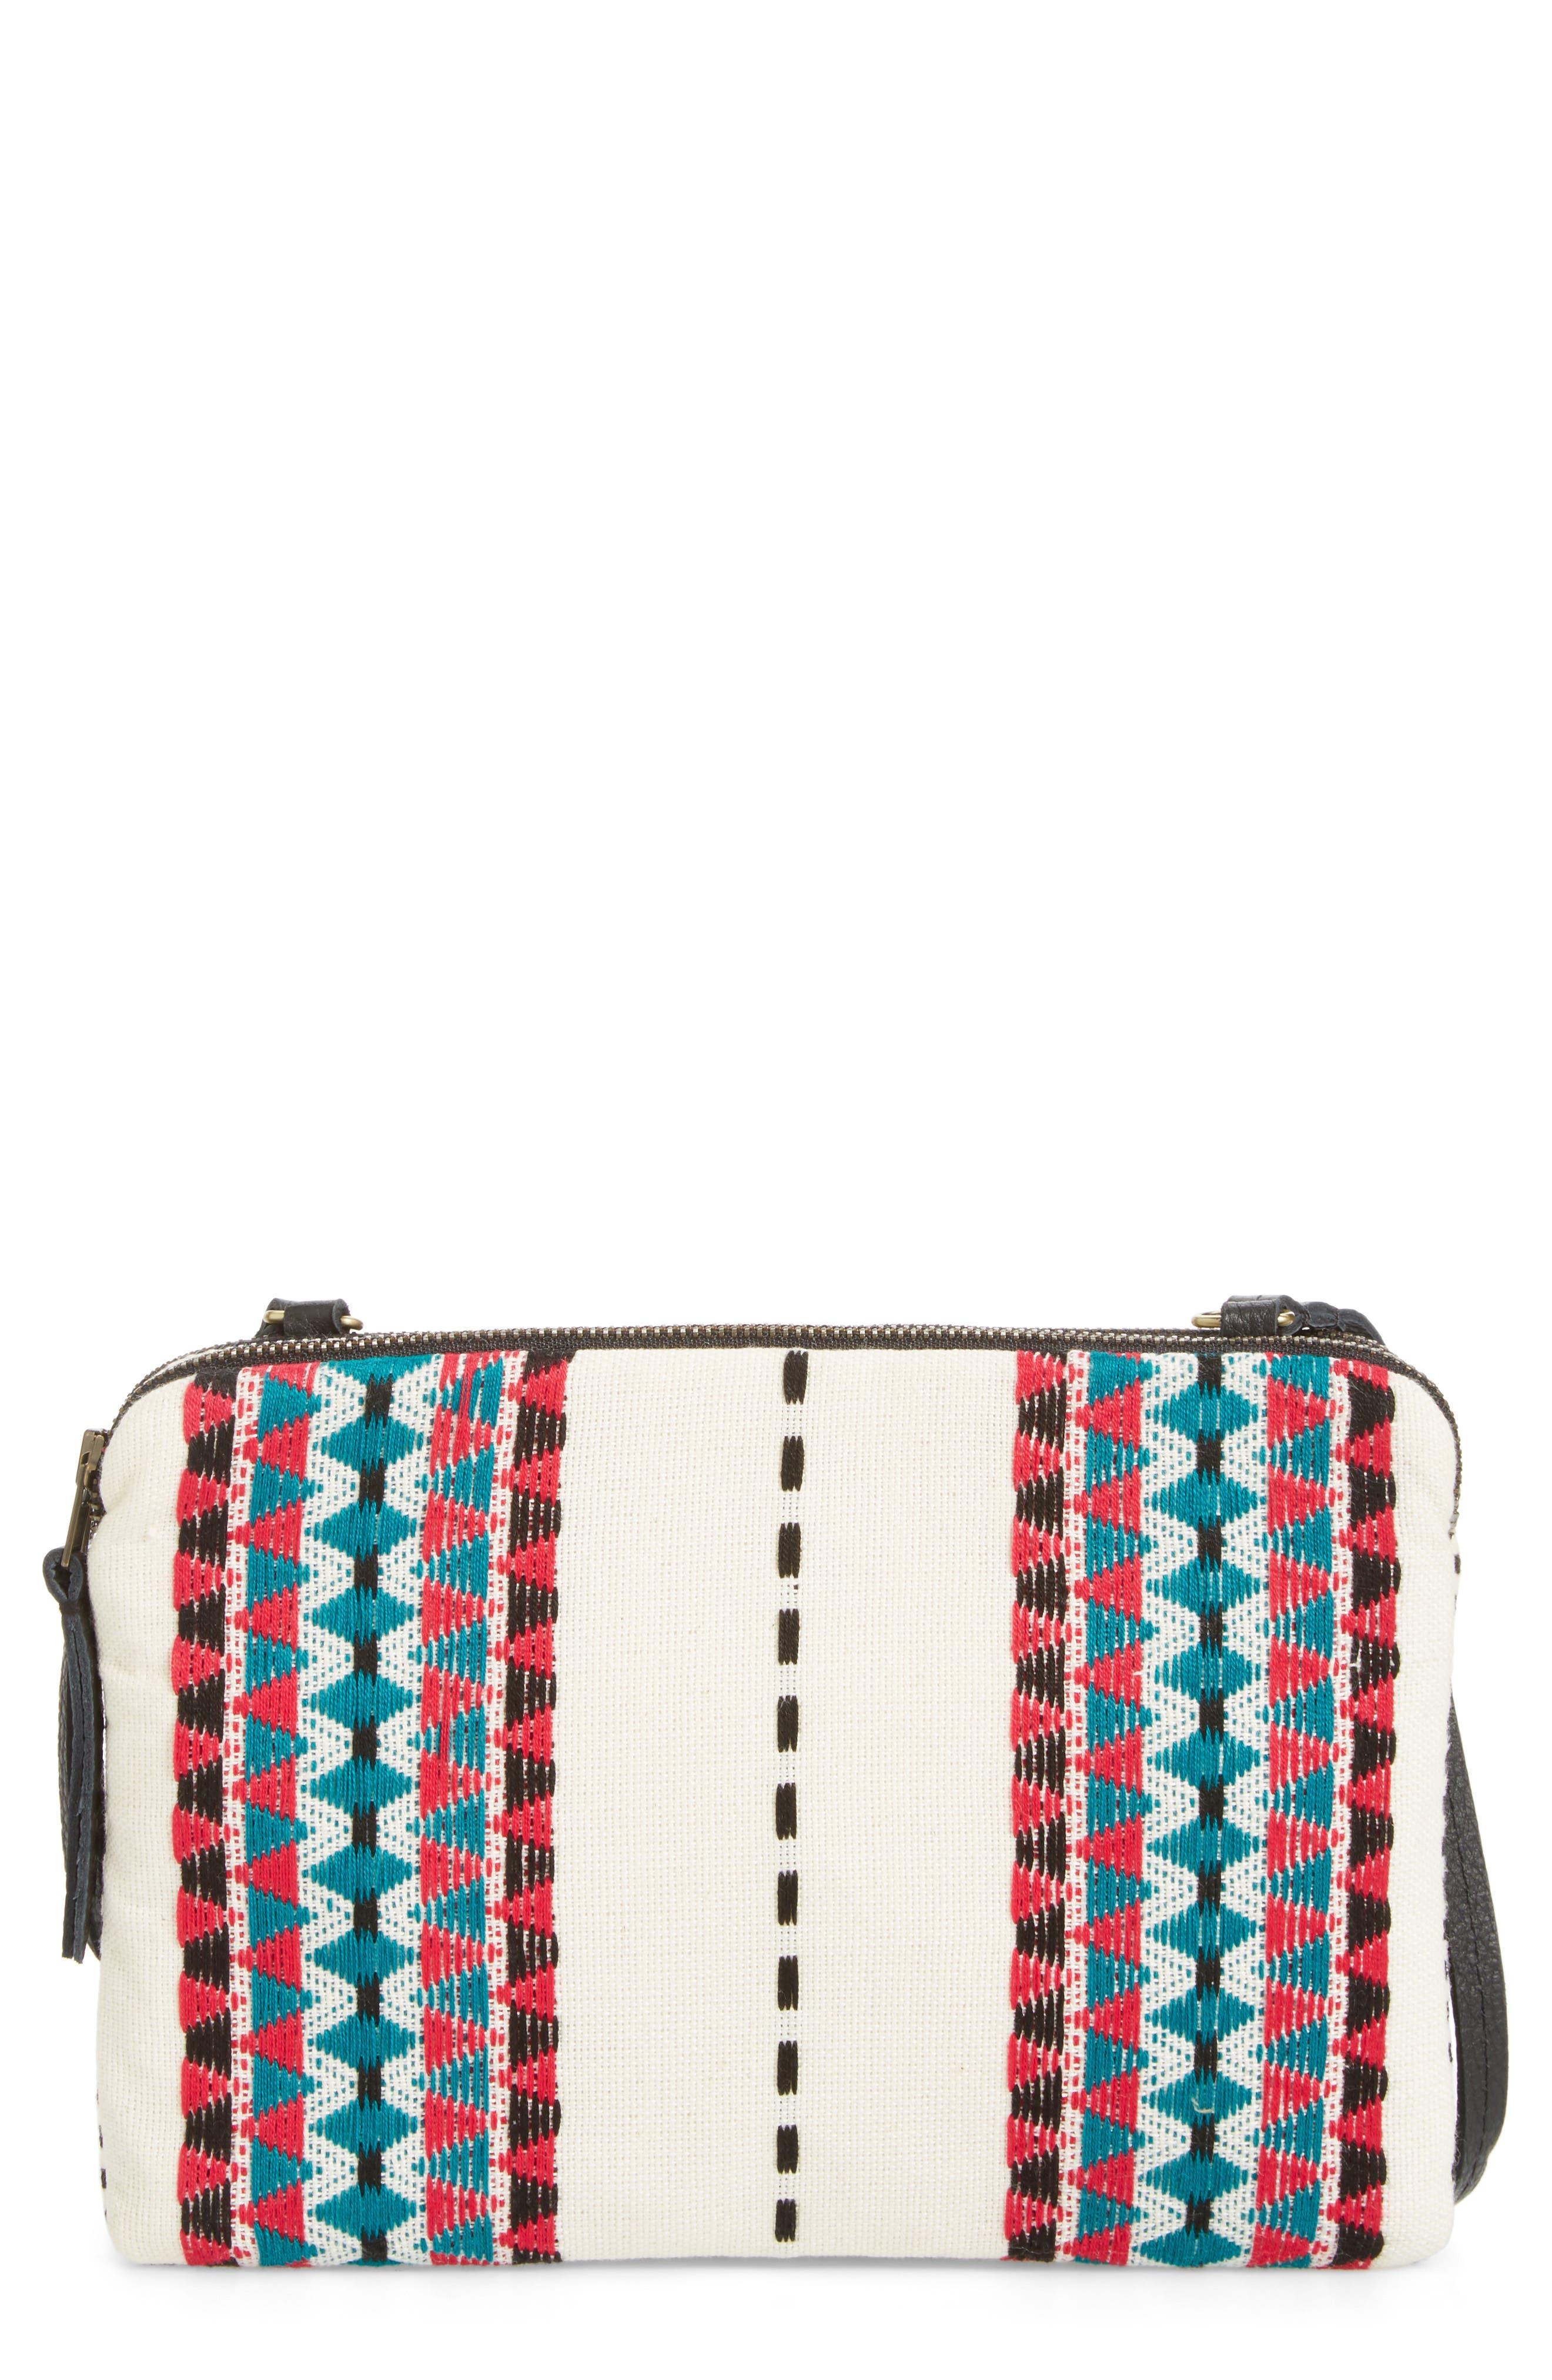 Alternate Image 1 Selected - Mercado Global Andrea Canvas Crossbody Bag